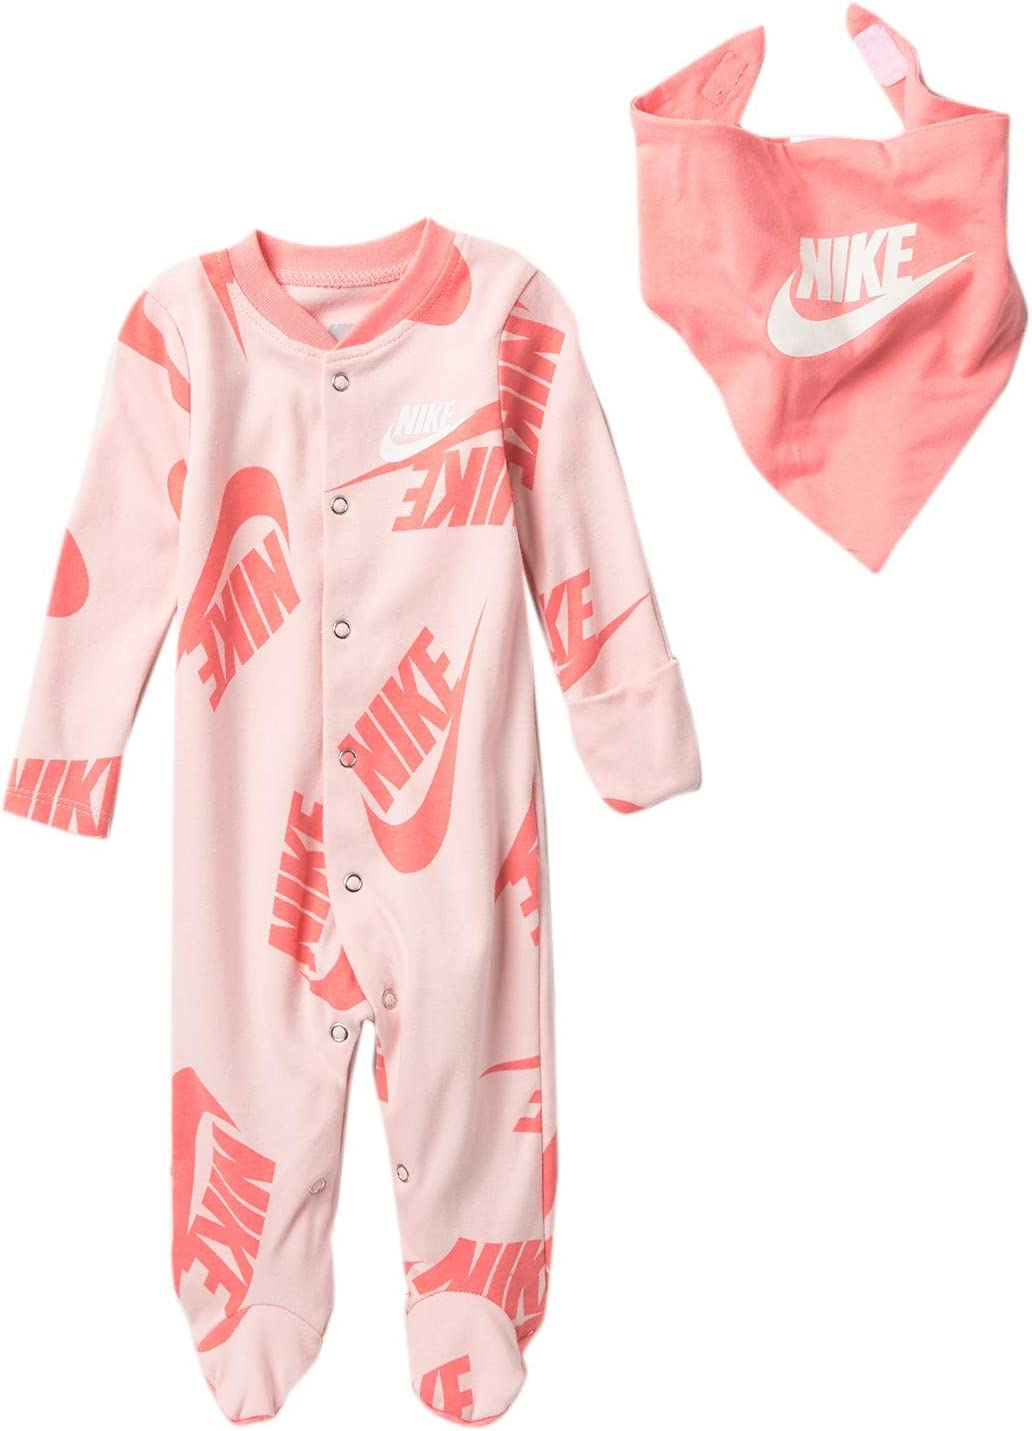 Nike Baby Coverall /& Bib 2 Piece Set